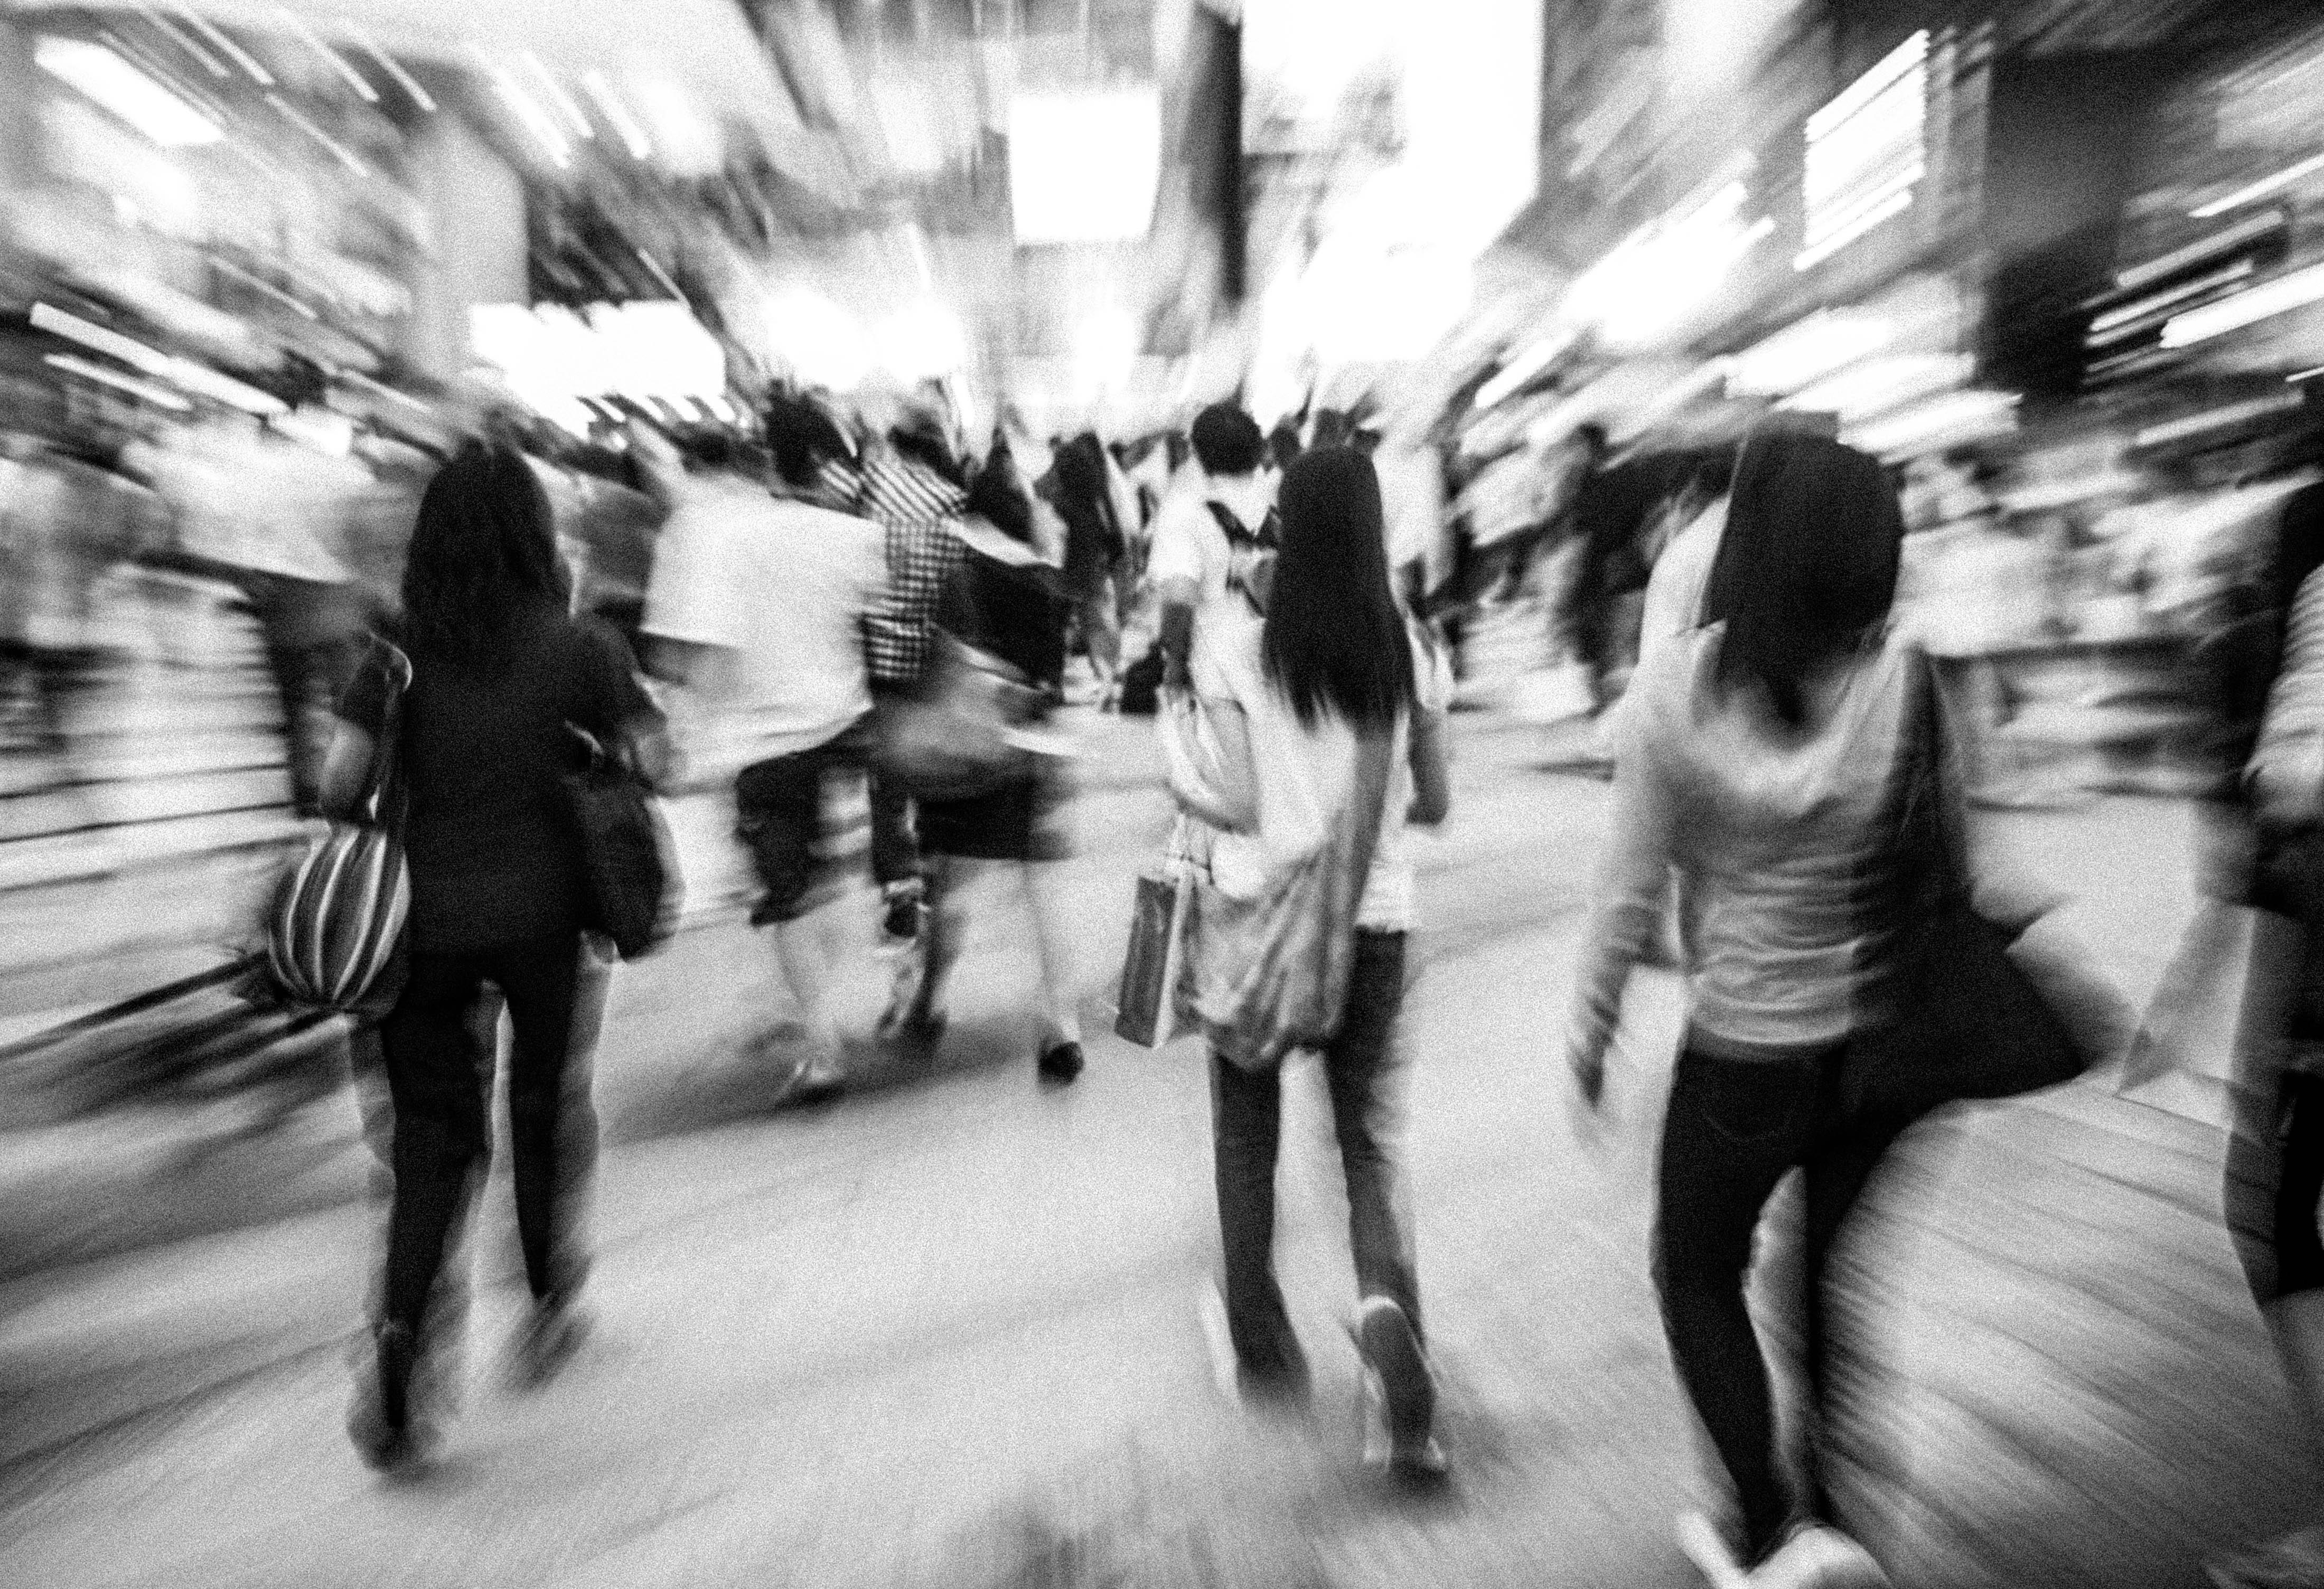 people-in-motion-PE2XKR5-13